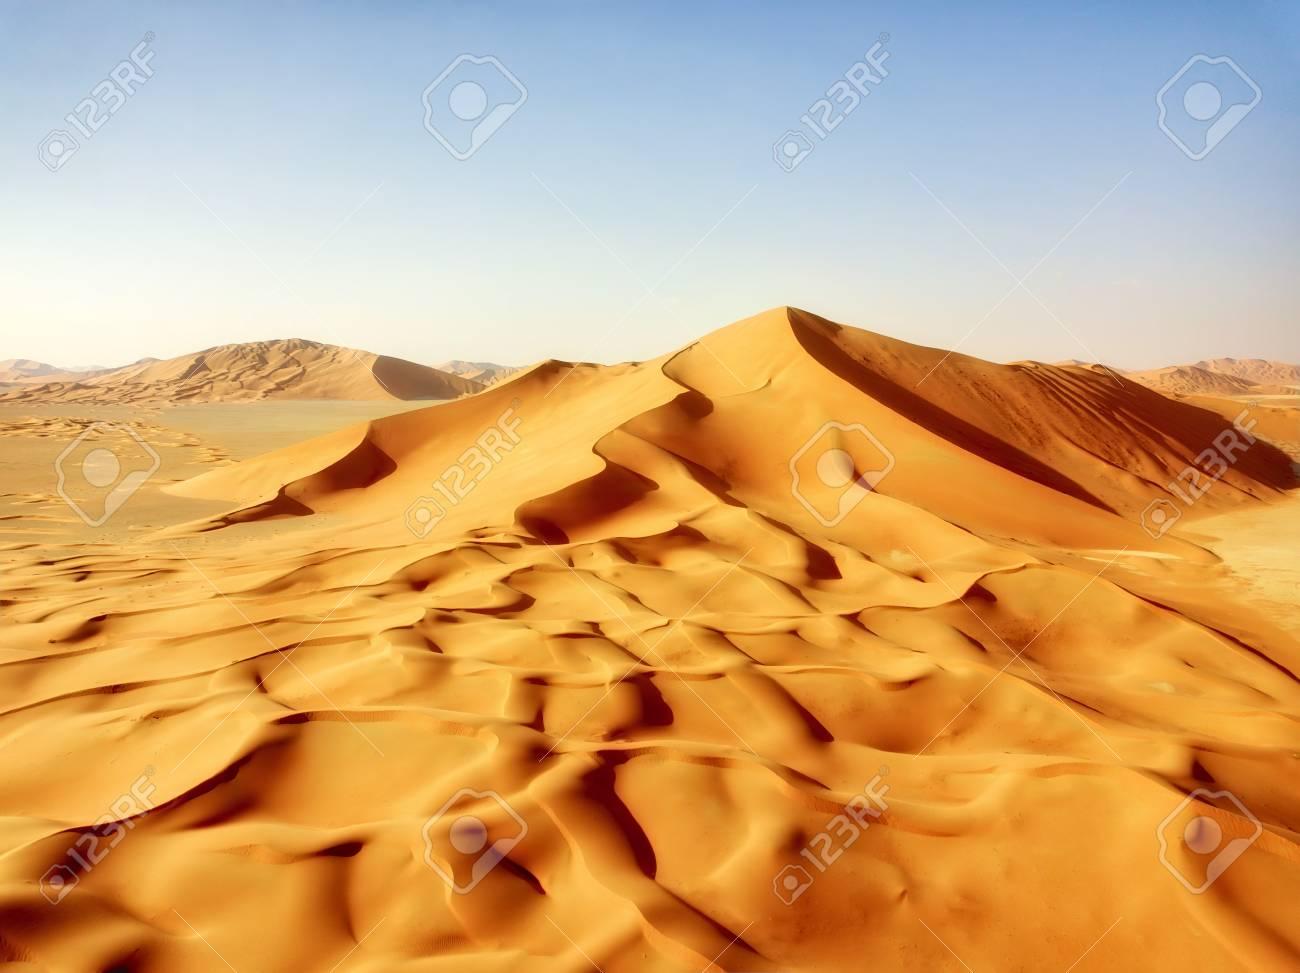 Empty Quarters in Oman and Saudi Arabia taken in 2015 - 98376729